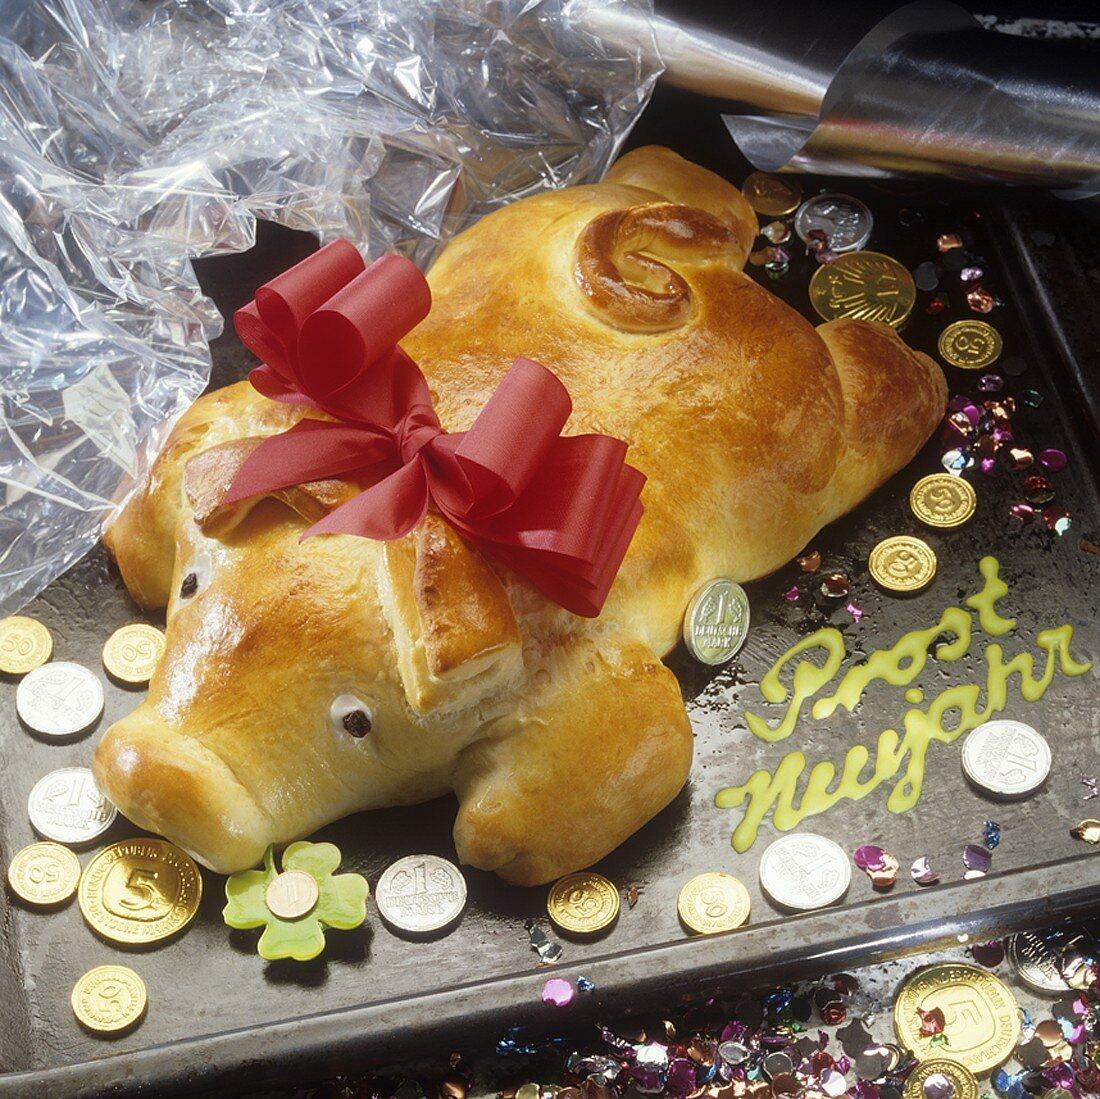 Lucky pig (bread dough), coins & 'Prost Neujahr' (New Year wish)